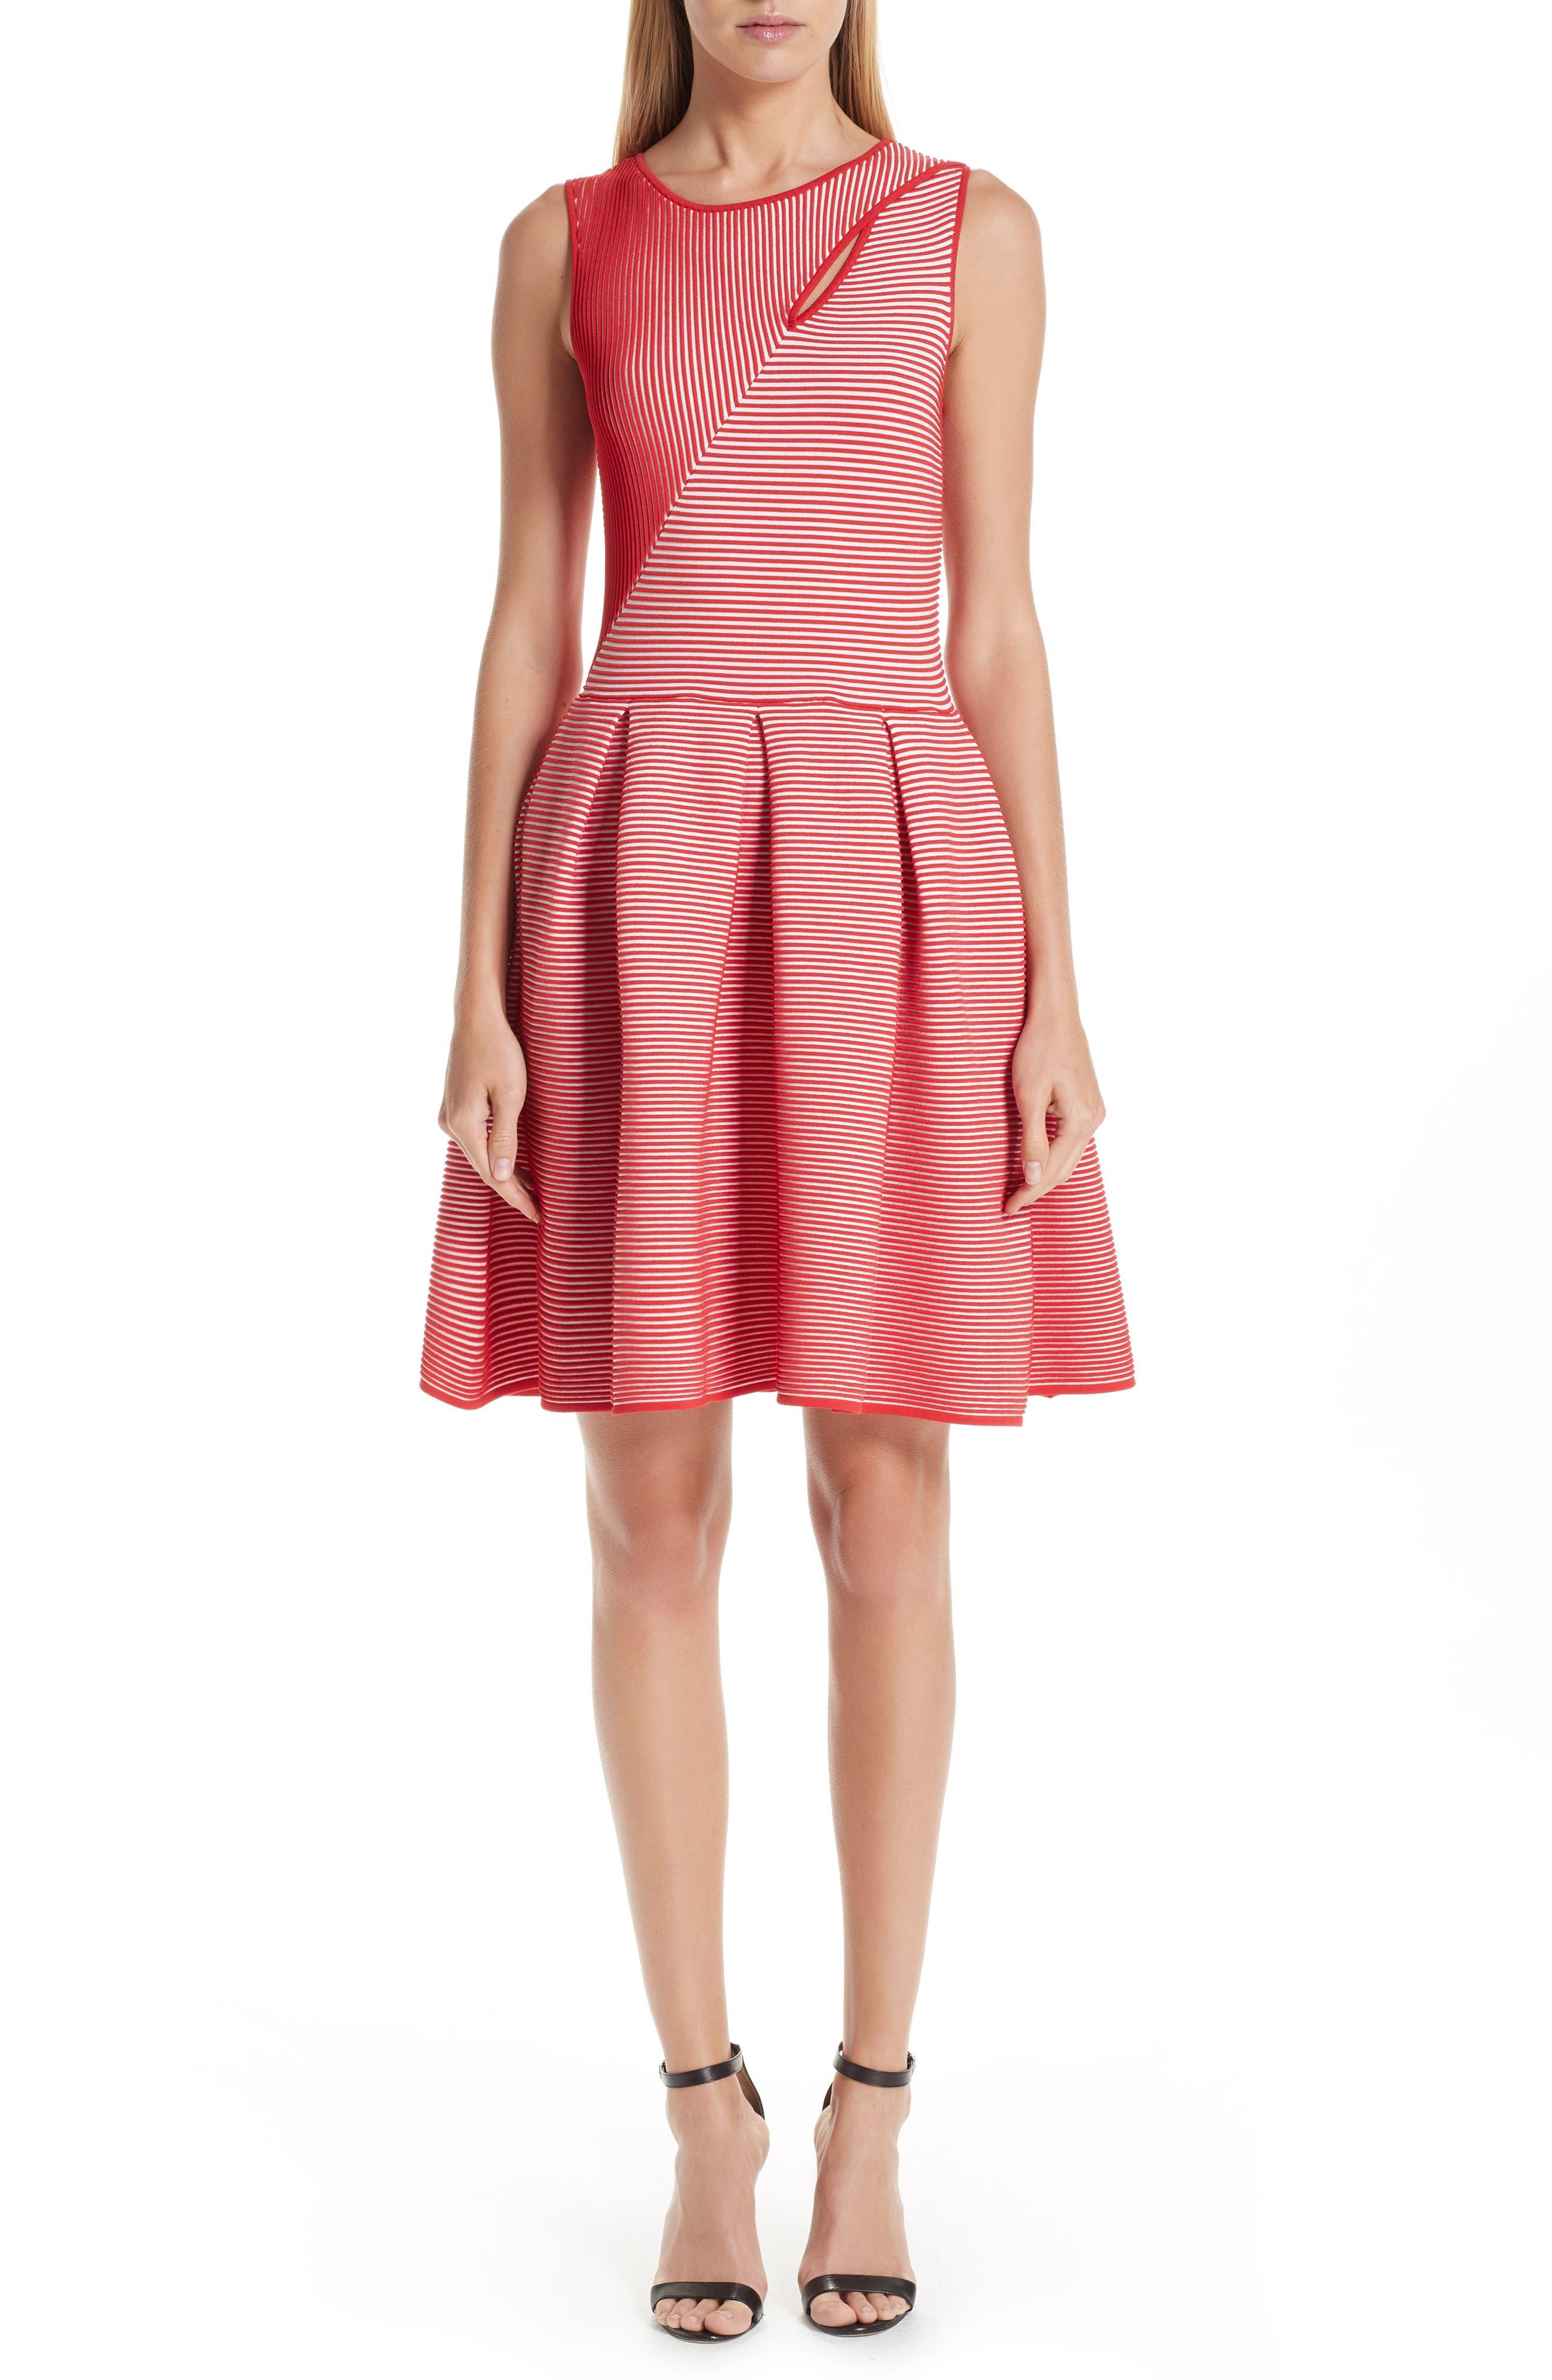 Emporio Armani Stripe Knit Jersey Dress, US / 40 IT - Pink